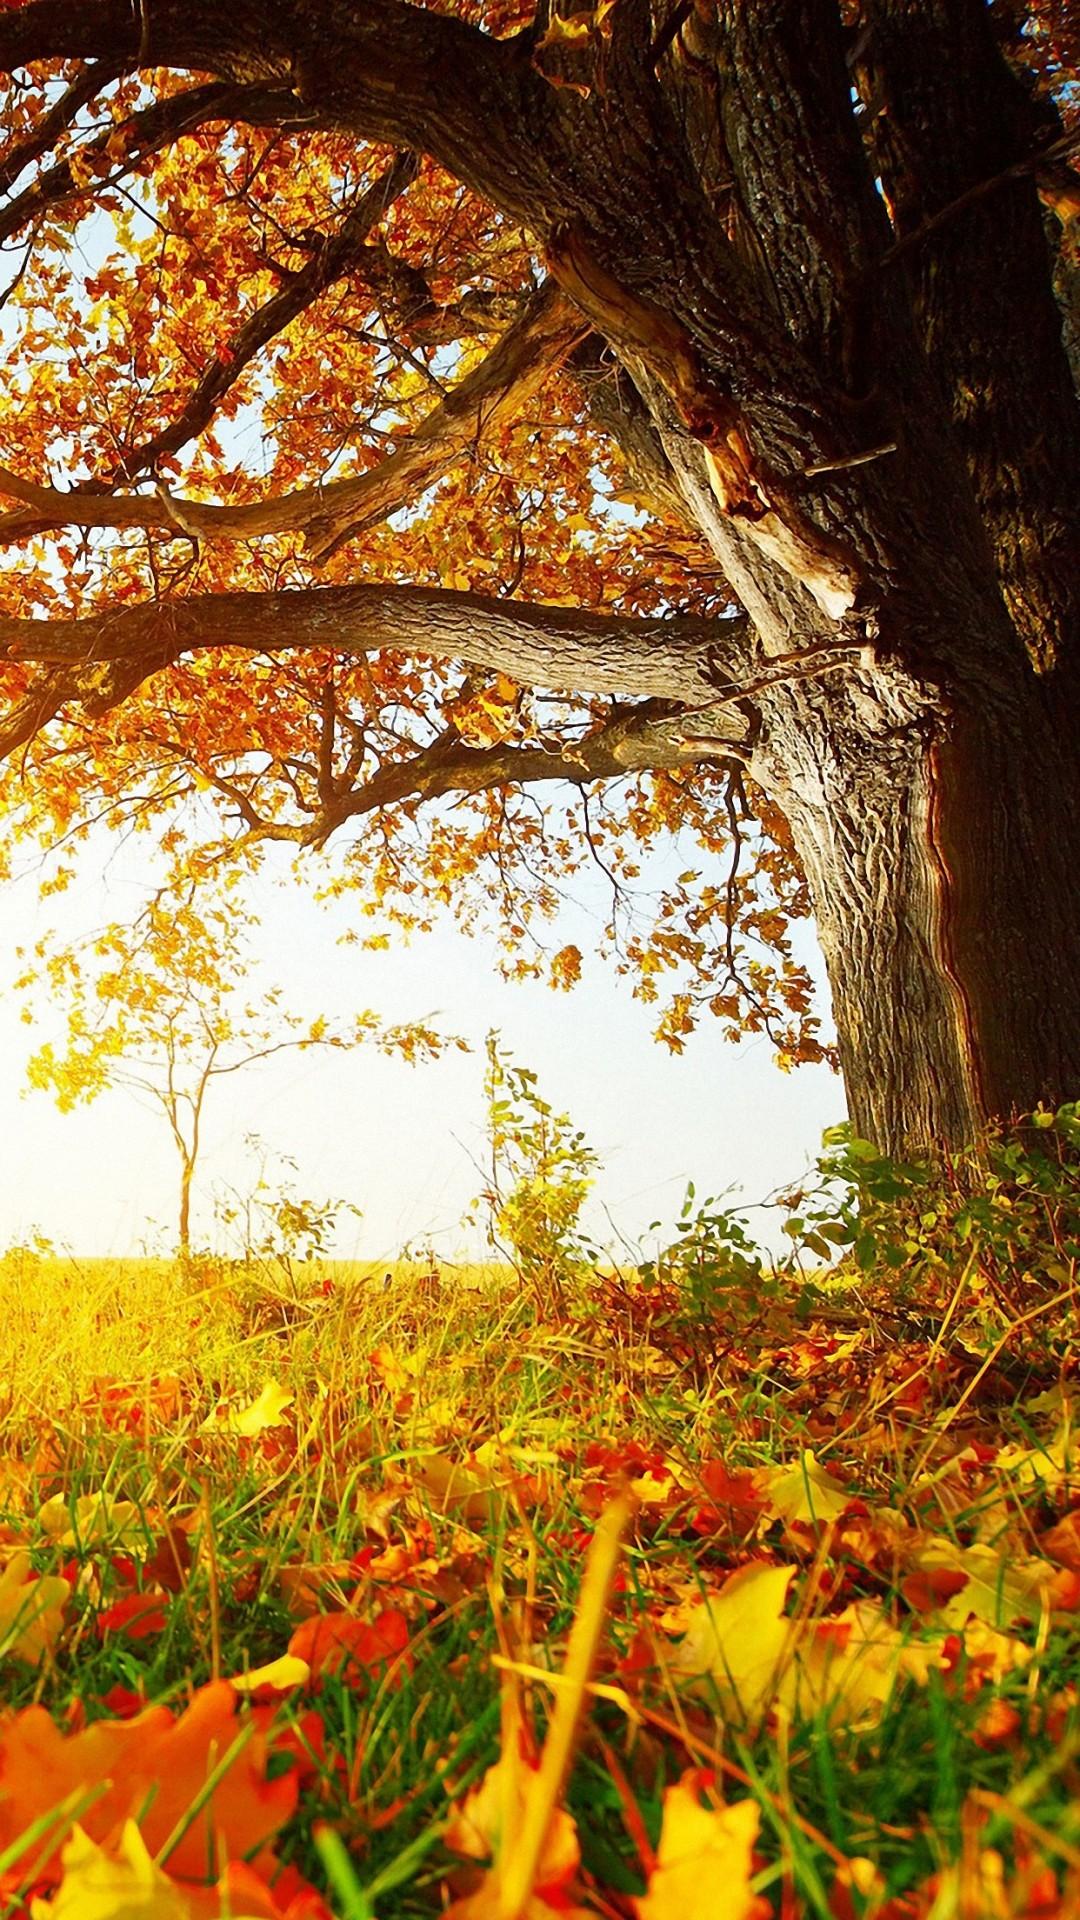 IPhone 6 Autumn Wallpaper (87+ images)